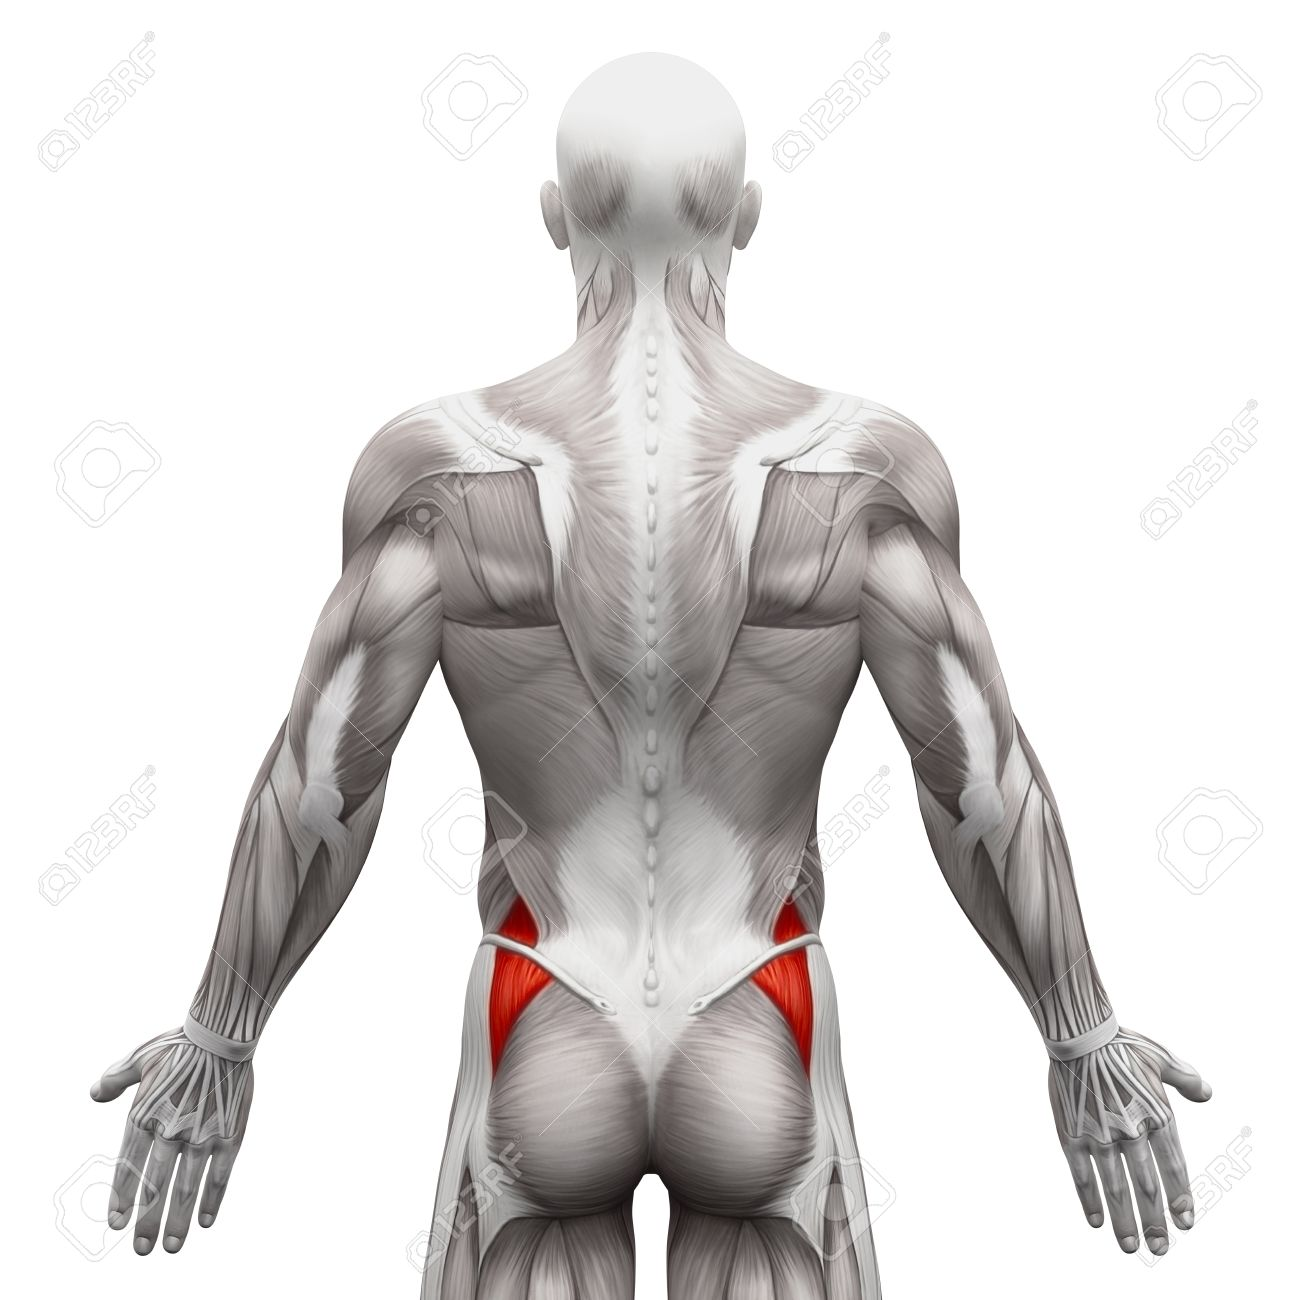 Gluteus Medius - Anatomy Muscles Isolated On White - 3D Illustration ...